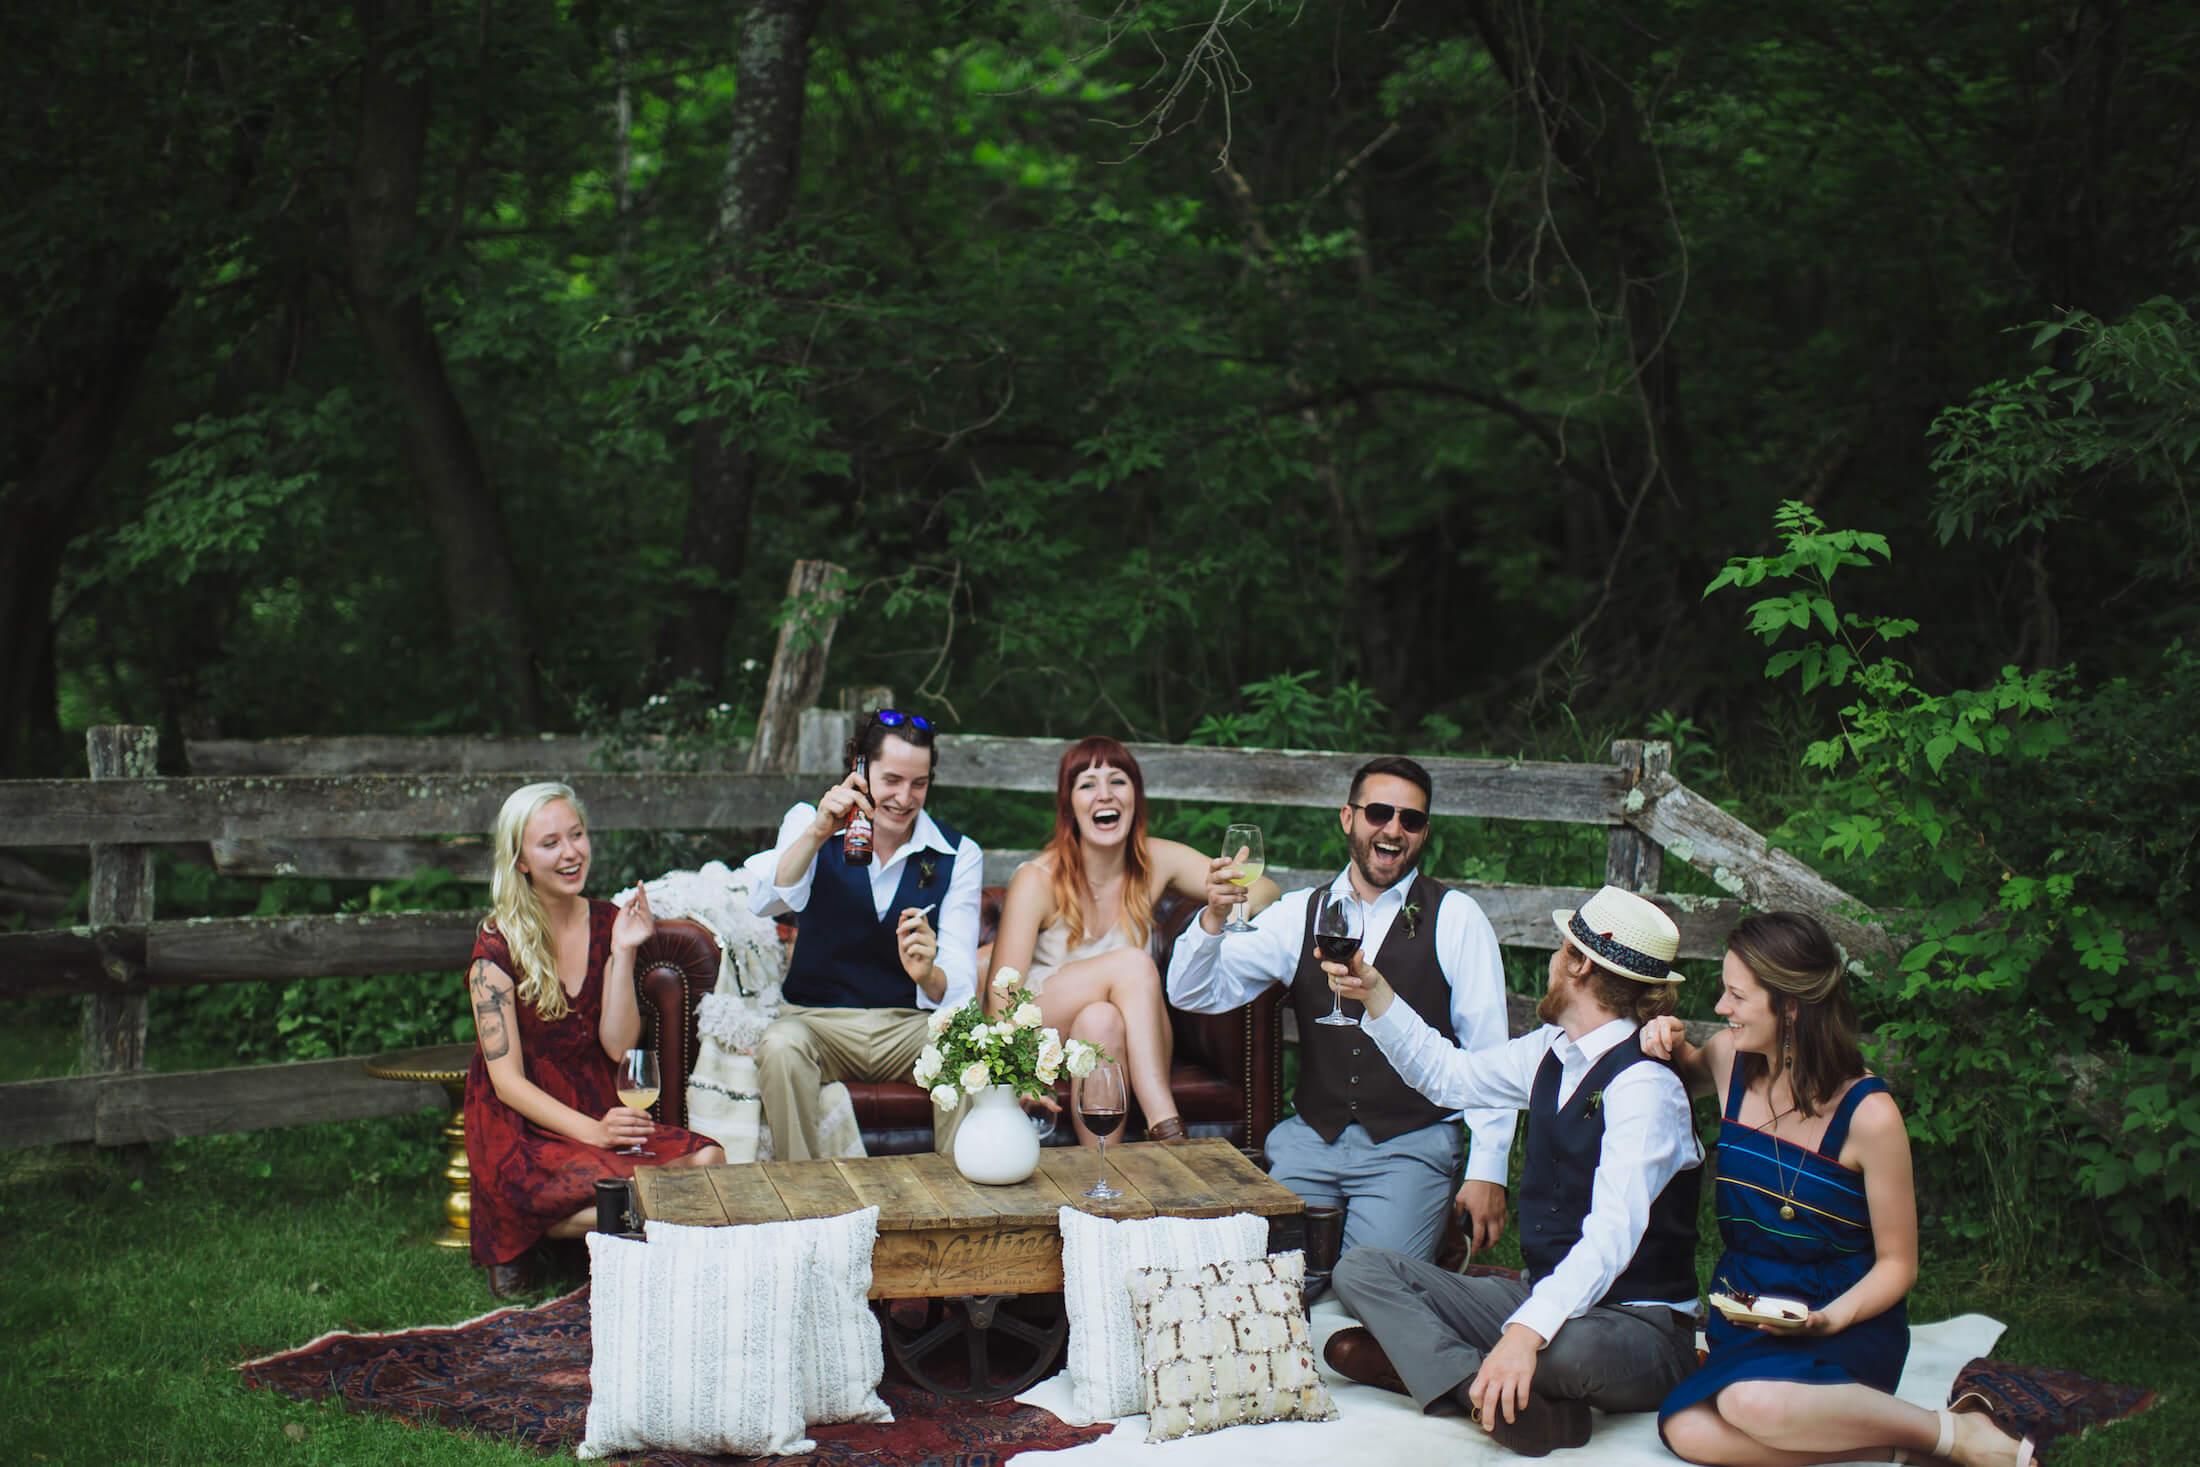 engle-olson-ray-kelly-photography-wisconsin-wedding-86.jpg